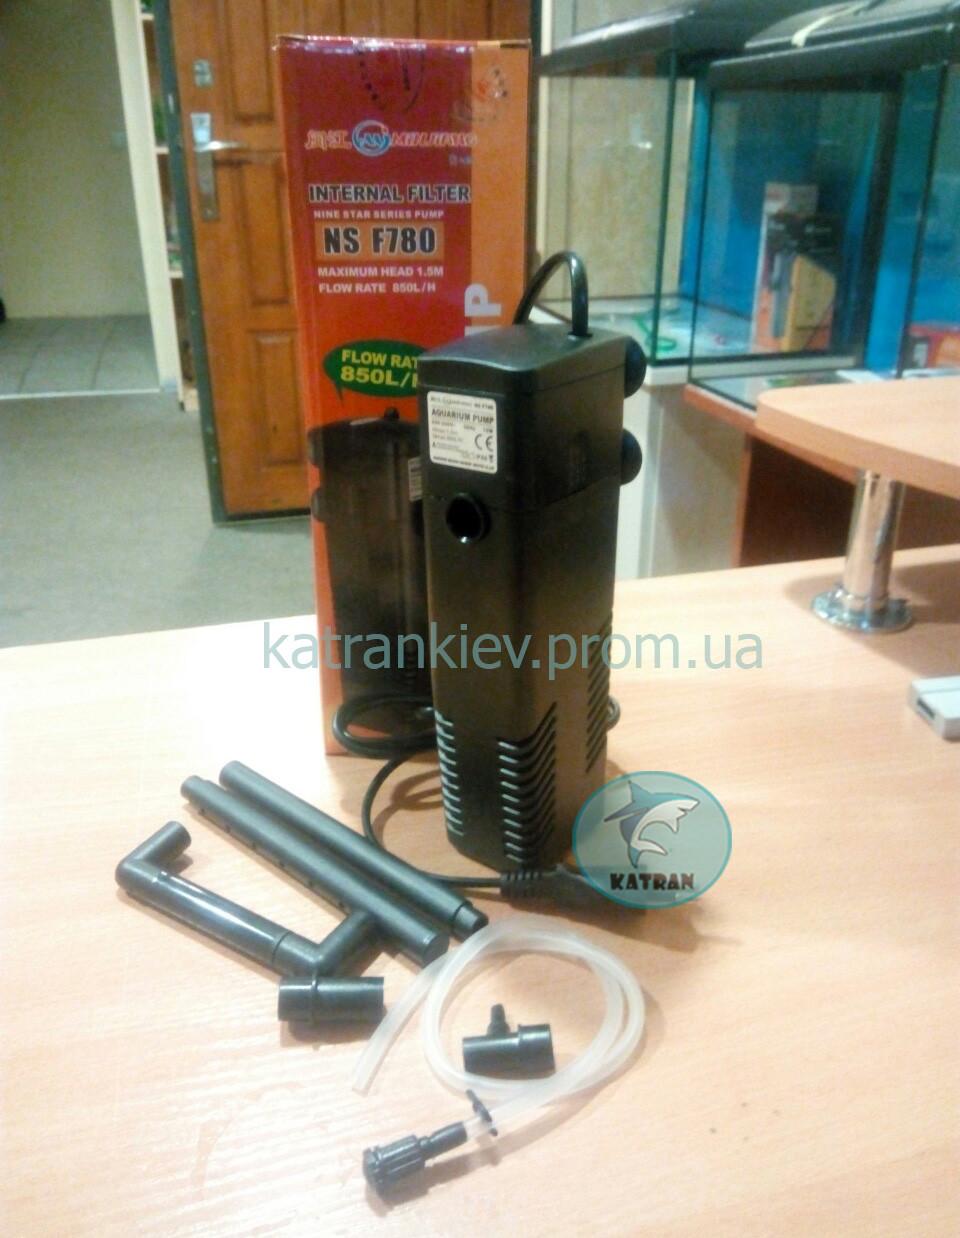 Внутренний фильтр NS f 780  для аквариума до 150 л (850 л/ч) с флейтой